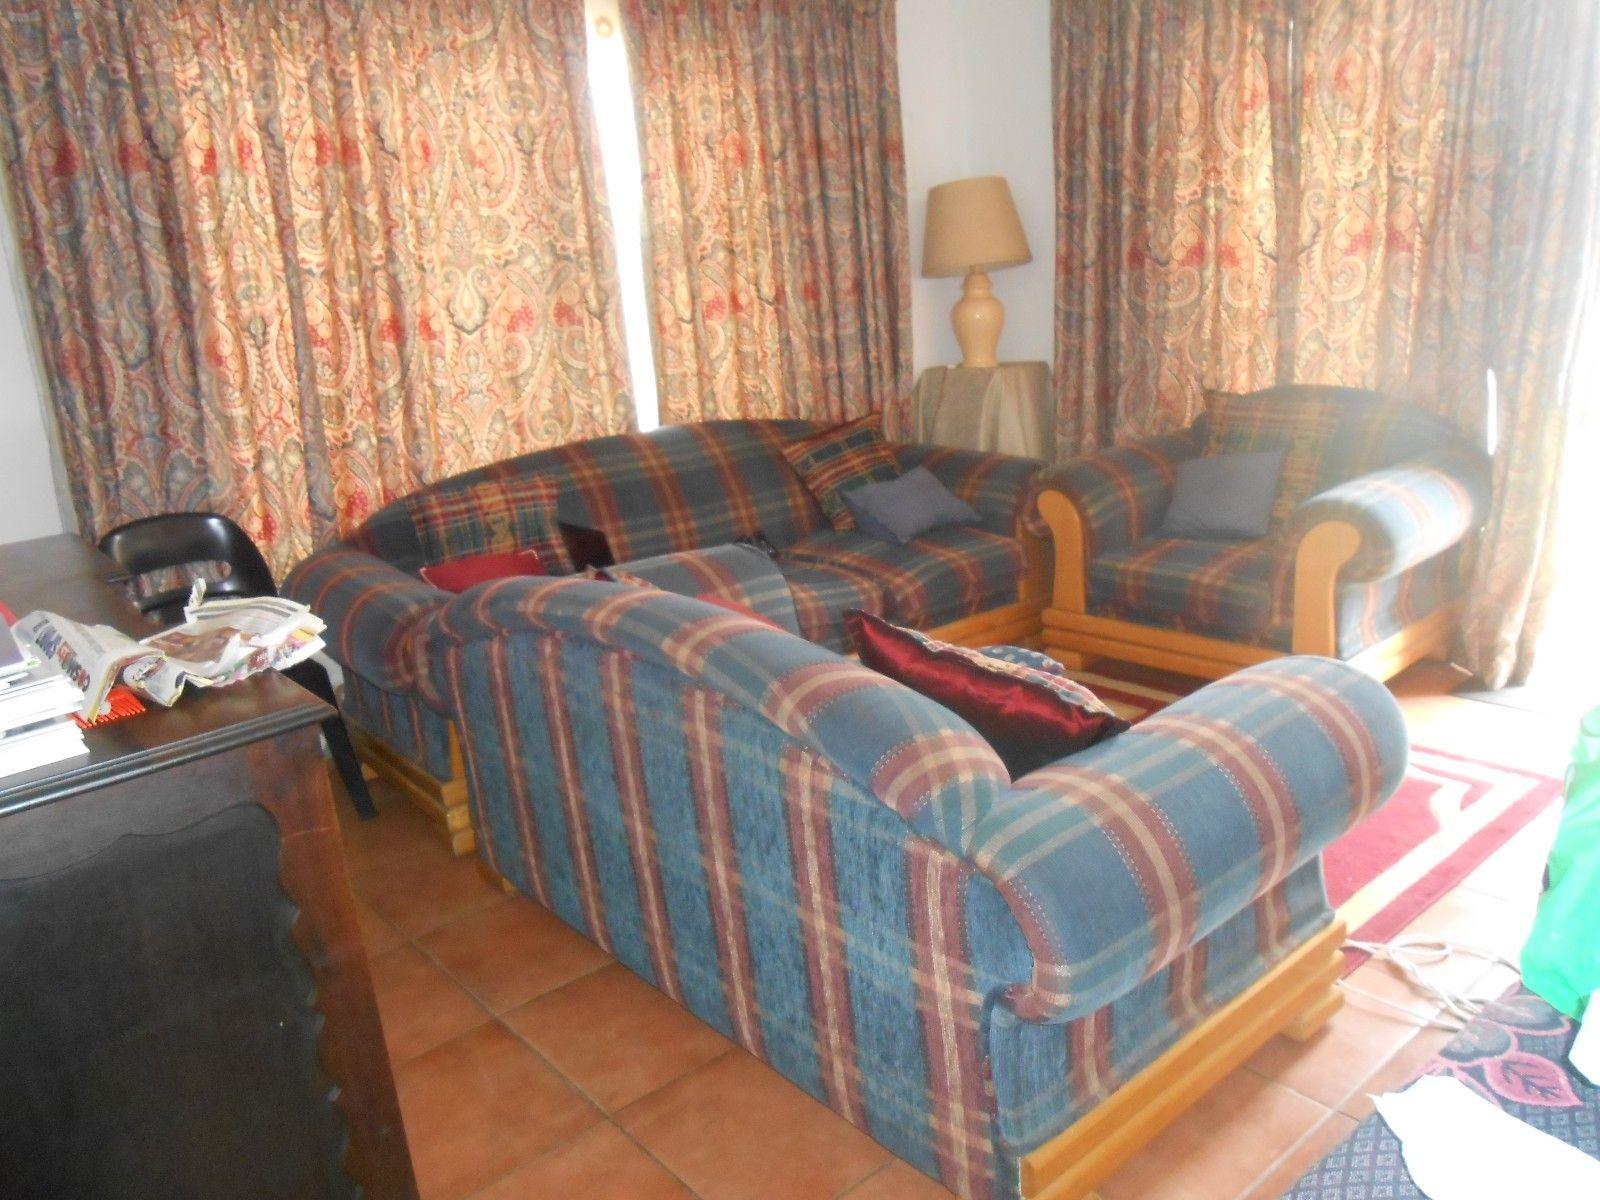 House For Sale In Cosmo City 3 Bedroom 13488902 1 1 Cyberprop